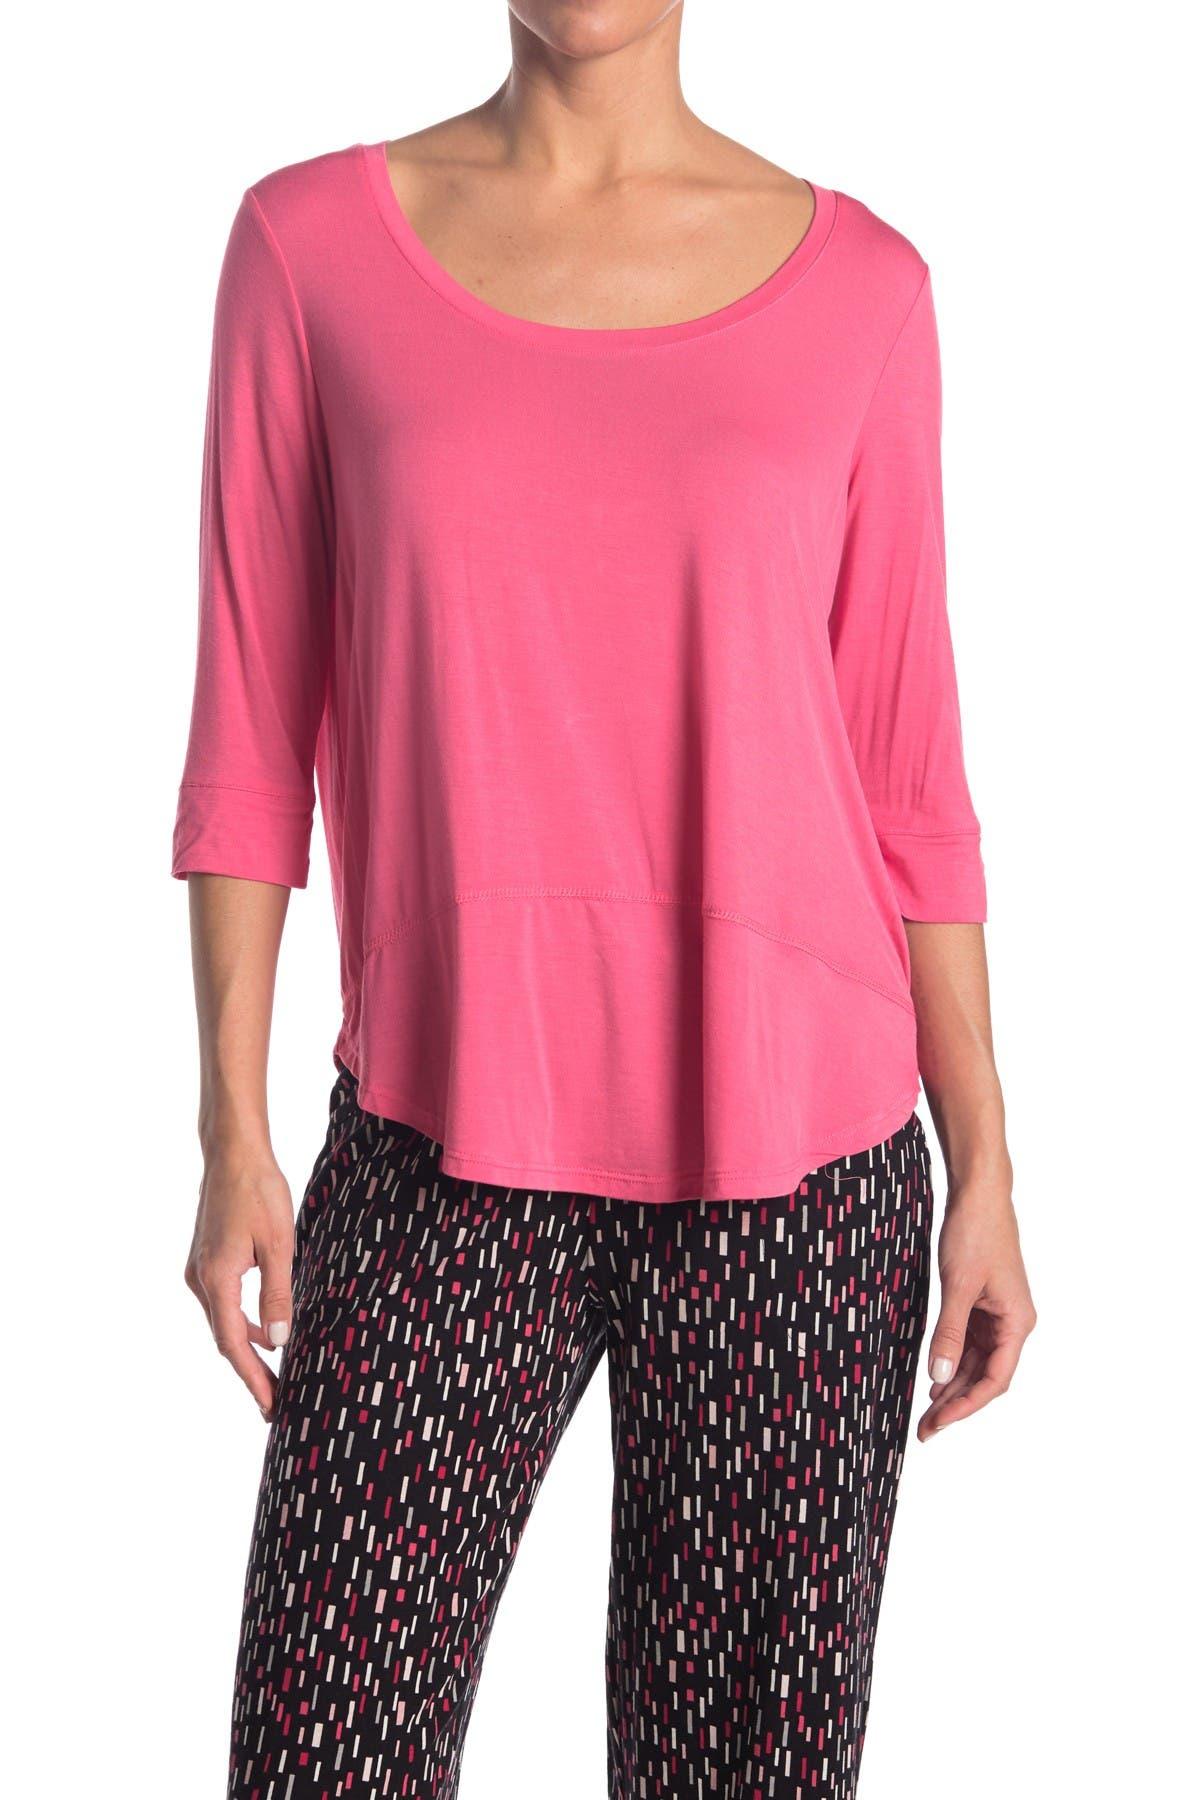 Image of HUE Solid 3/4 Sleeve Pajama T-Shirt